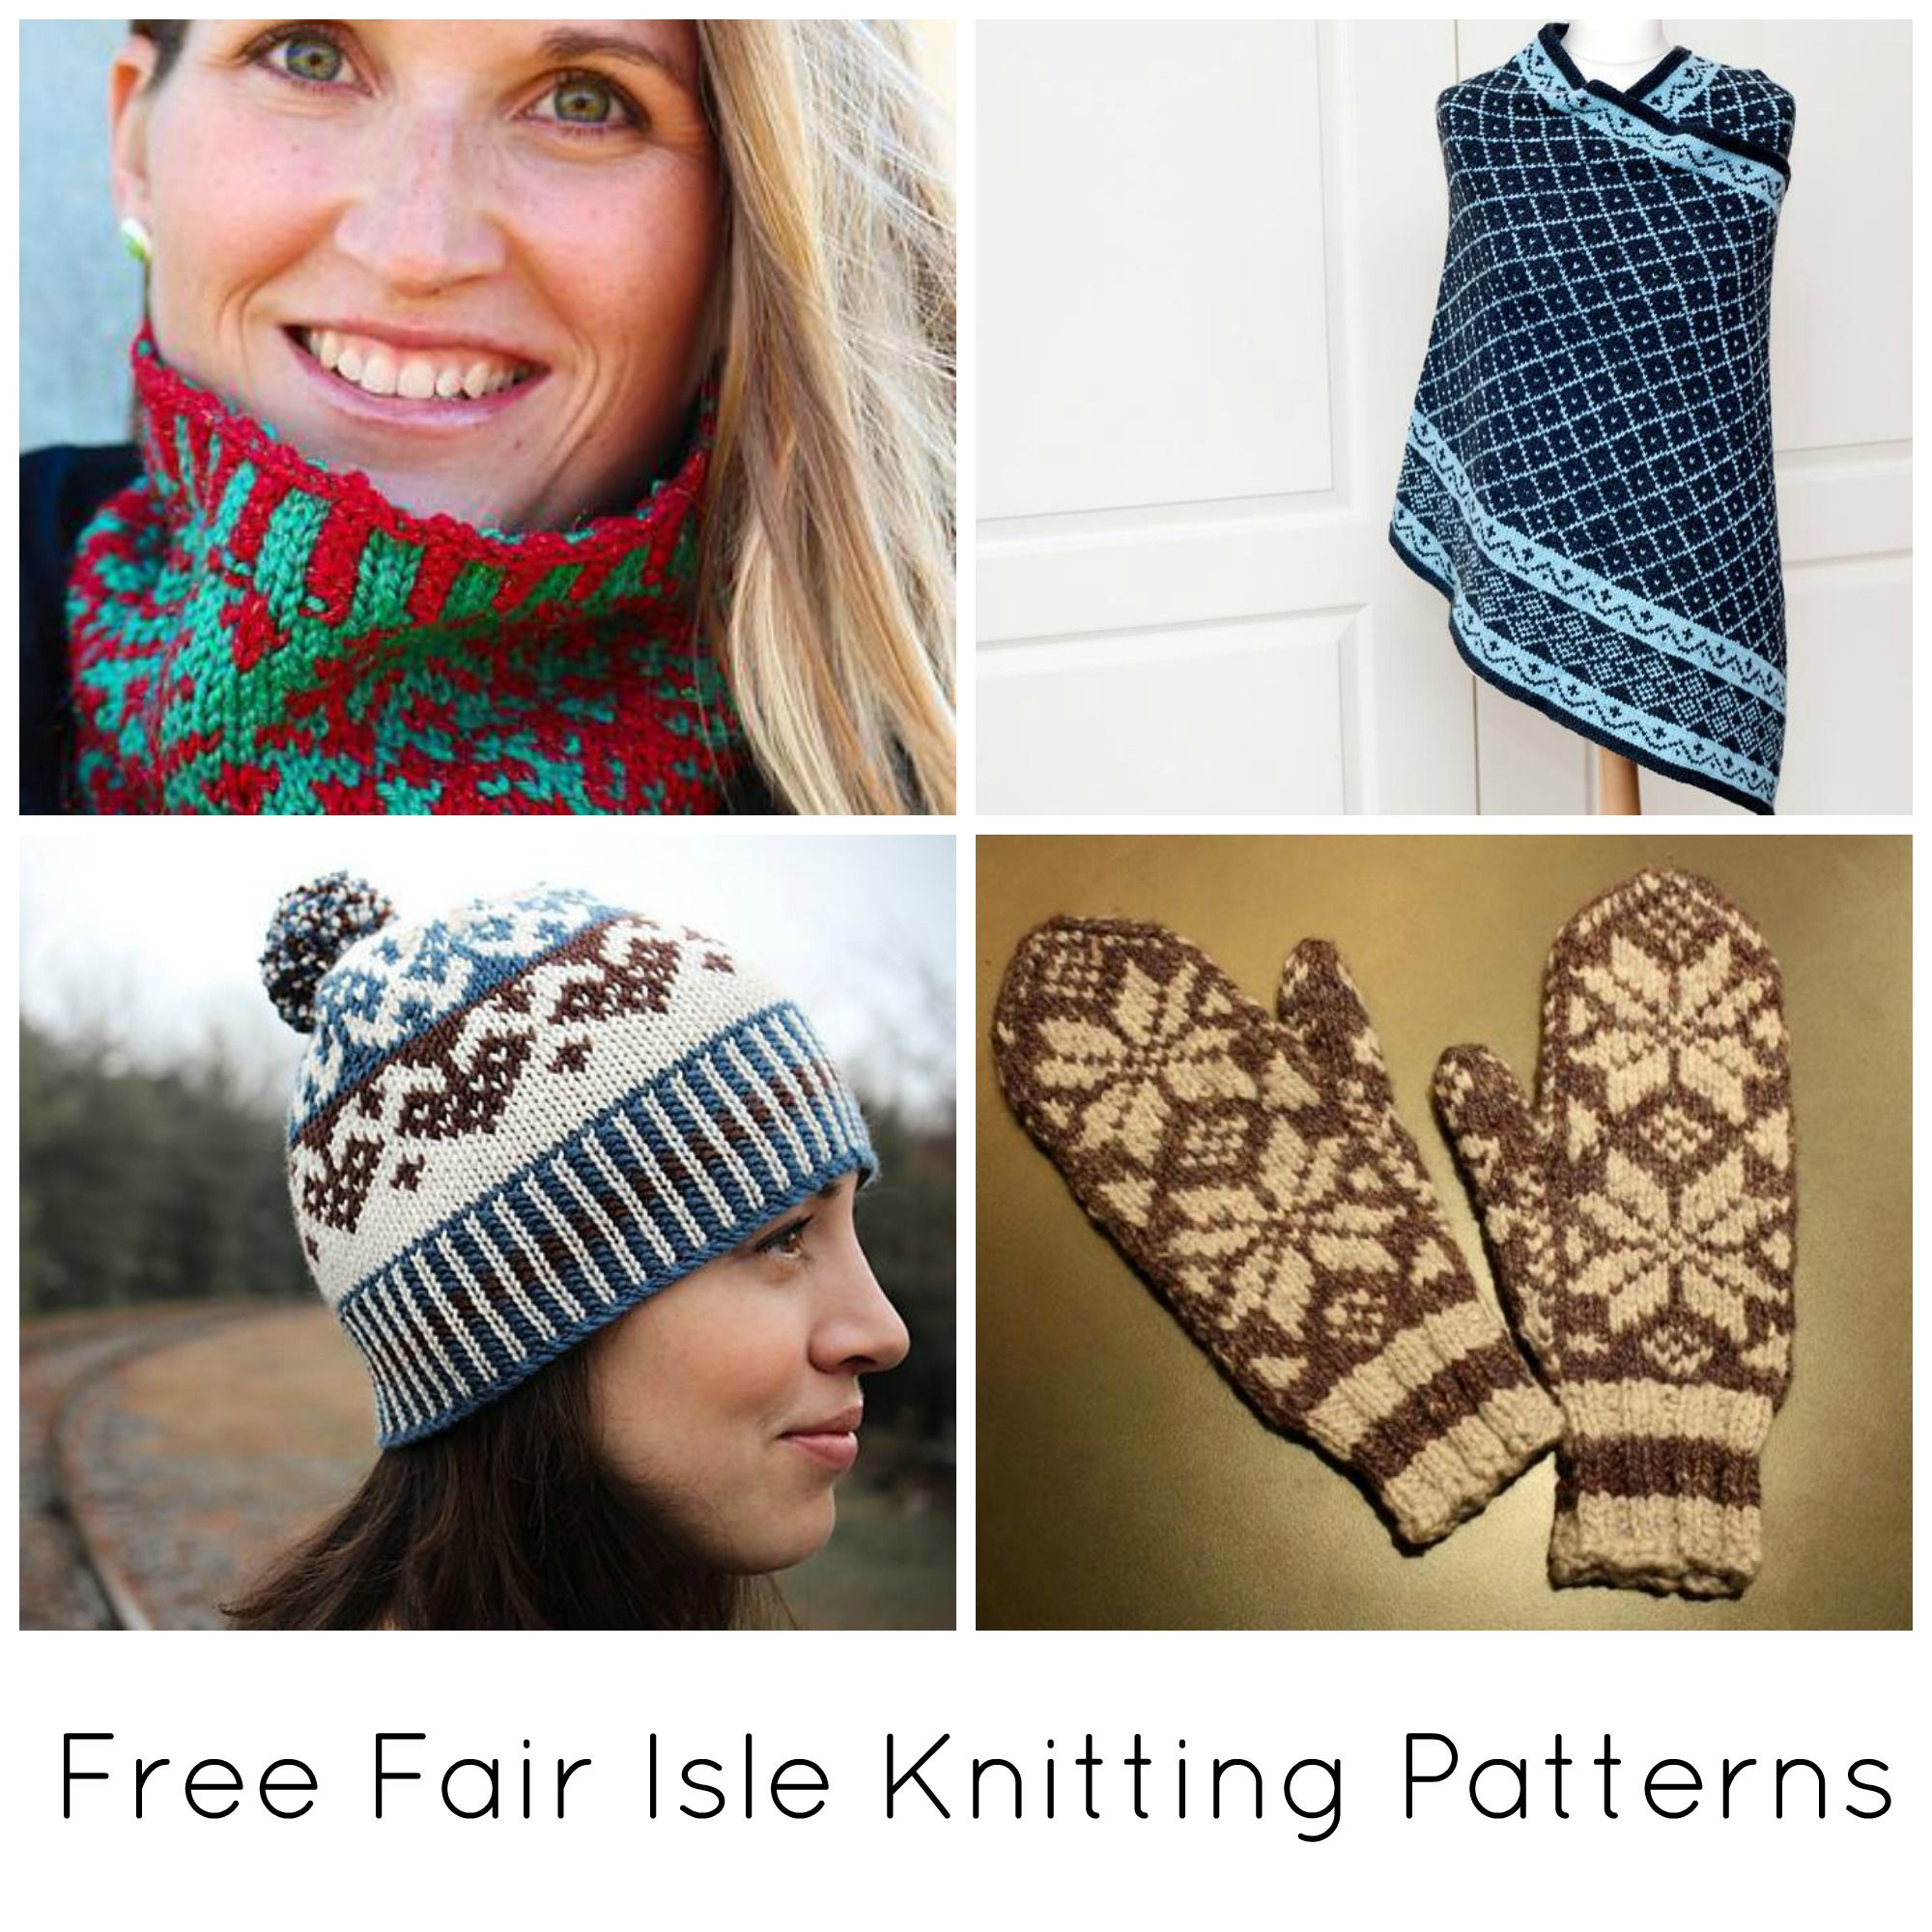 10 FREE Fair Isle Knitting Patterns on Craftsy | Pinterest ...